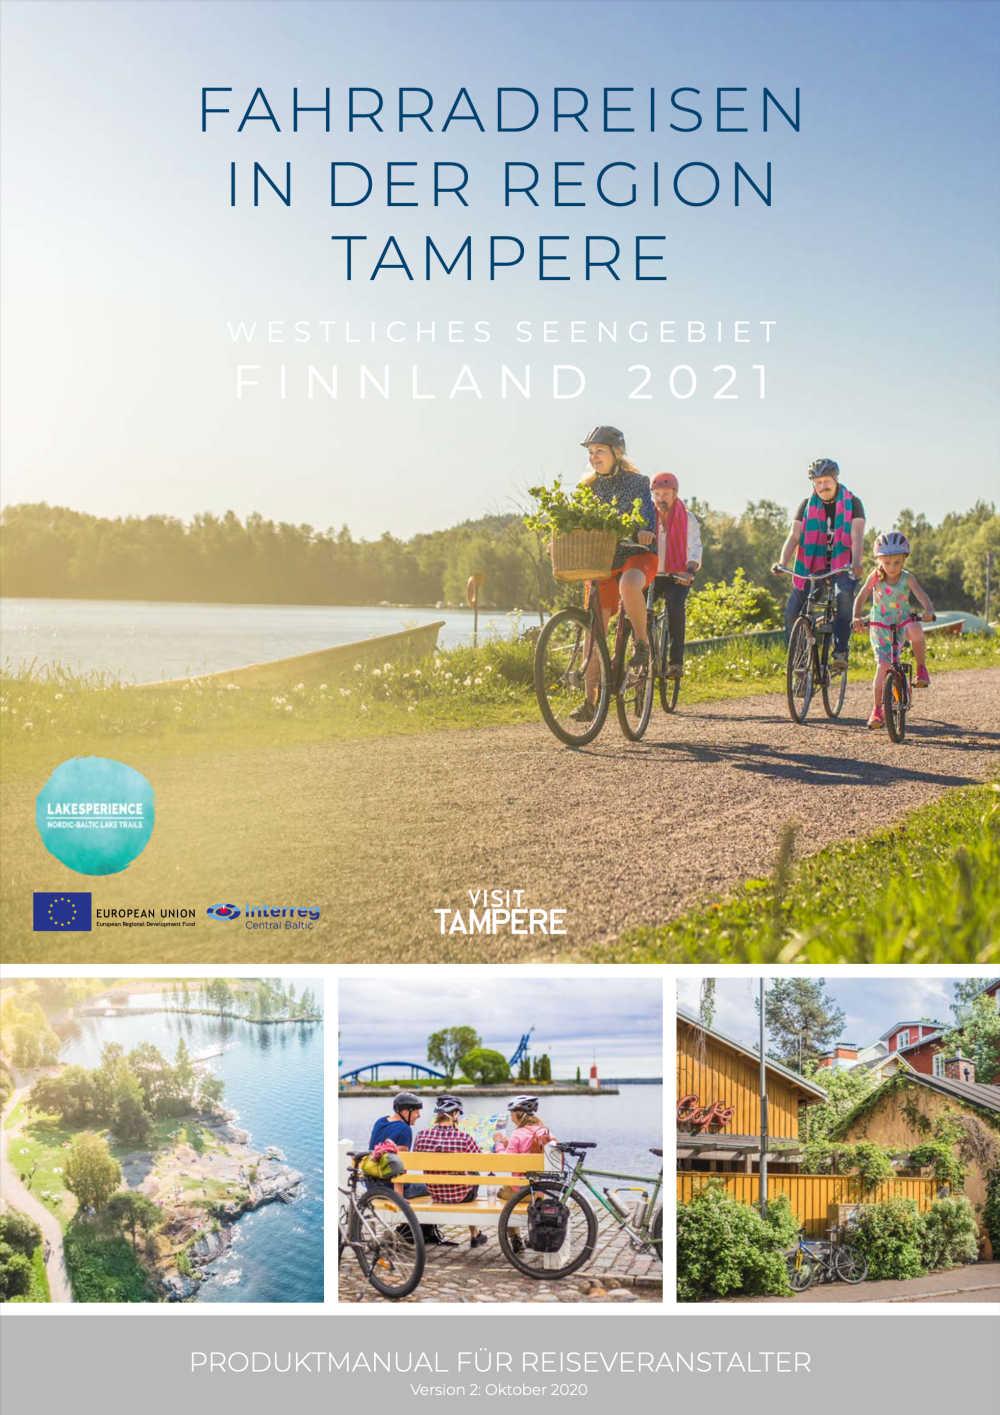 Produktmanual-Fahrradreisen-Region-Tampere-Finnland-2021